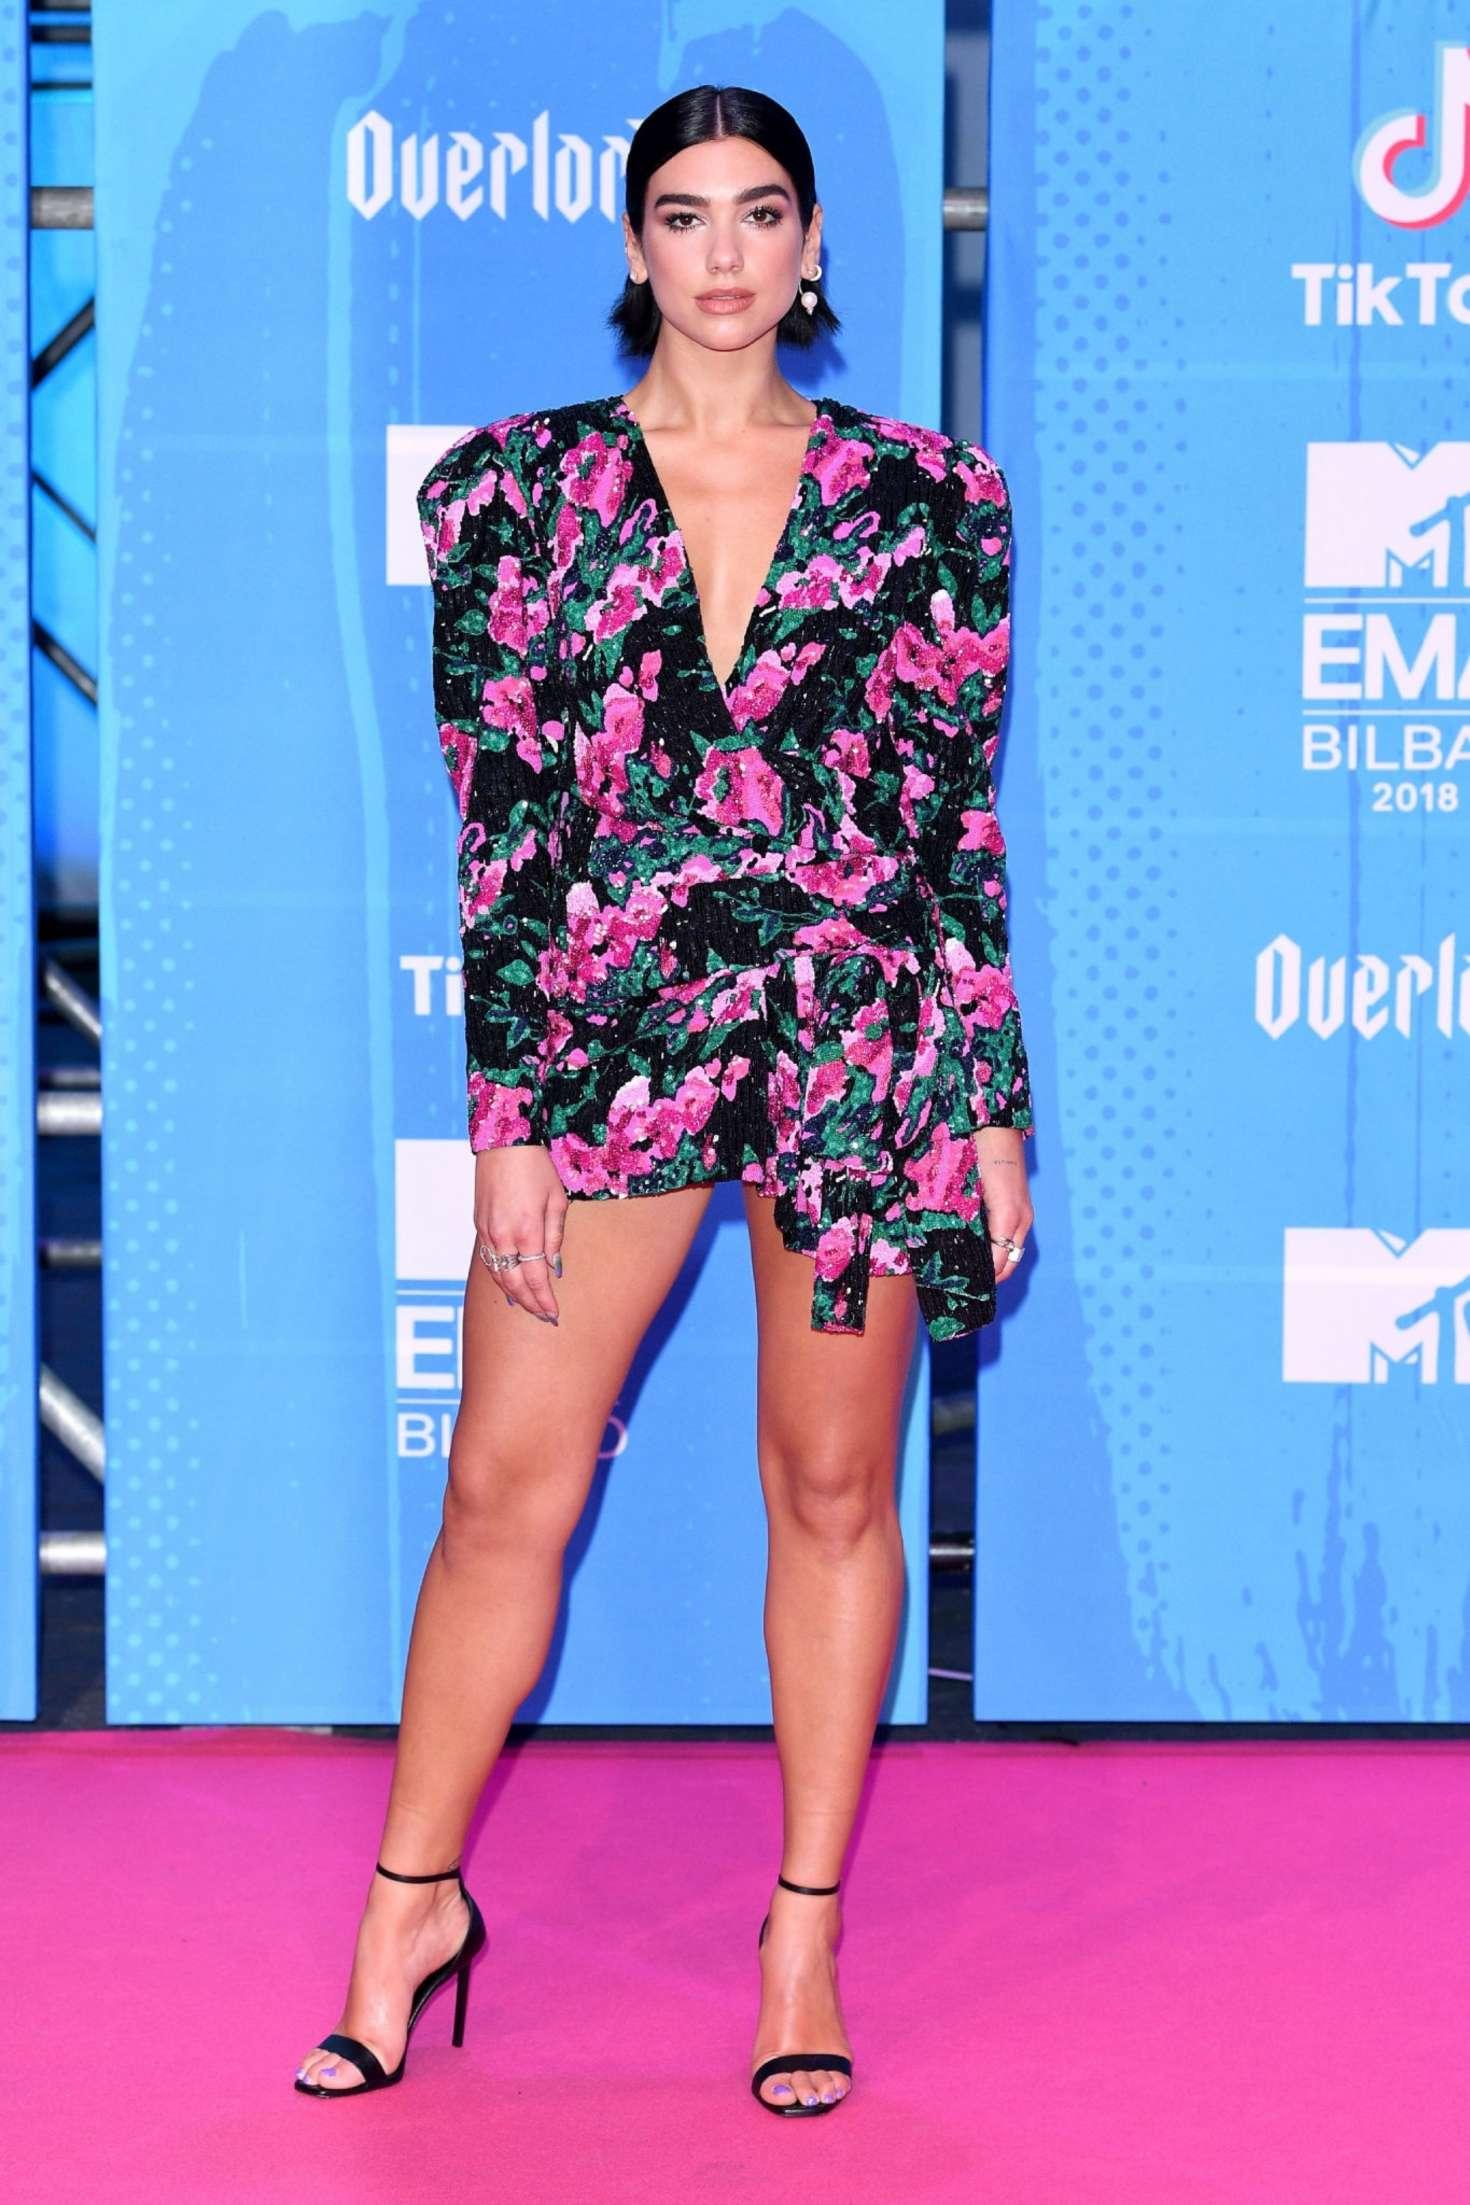 Dua Lipa - 2018 MTV Europe Music Awards in Bilbao